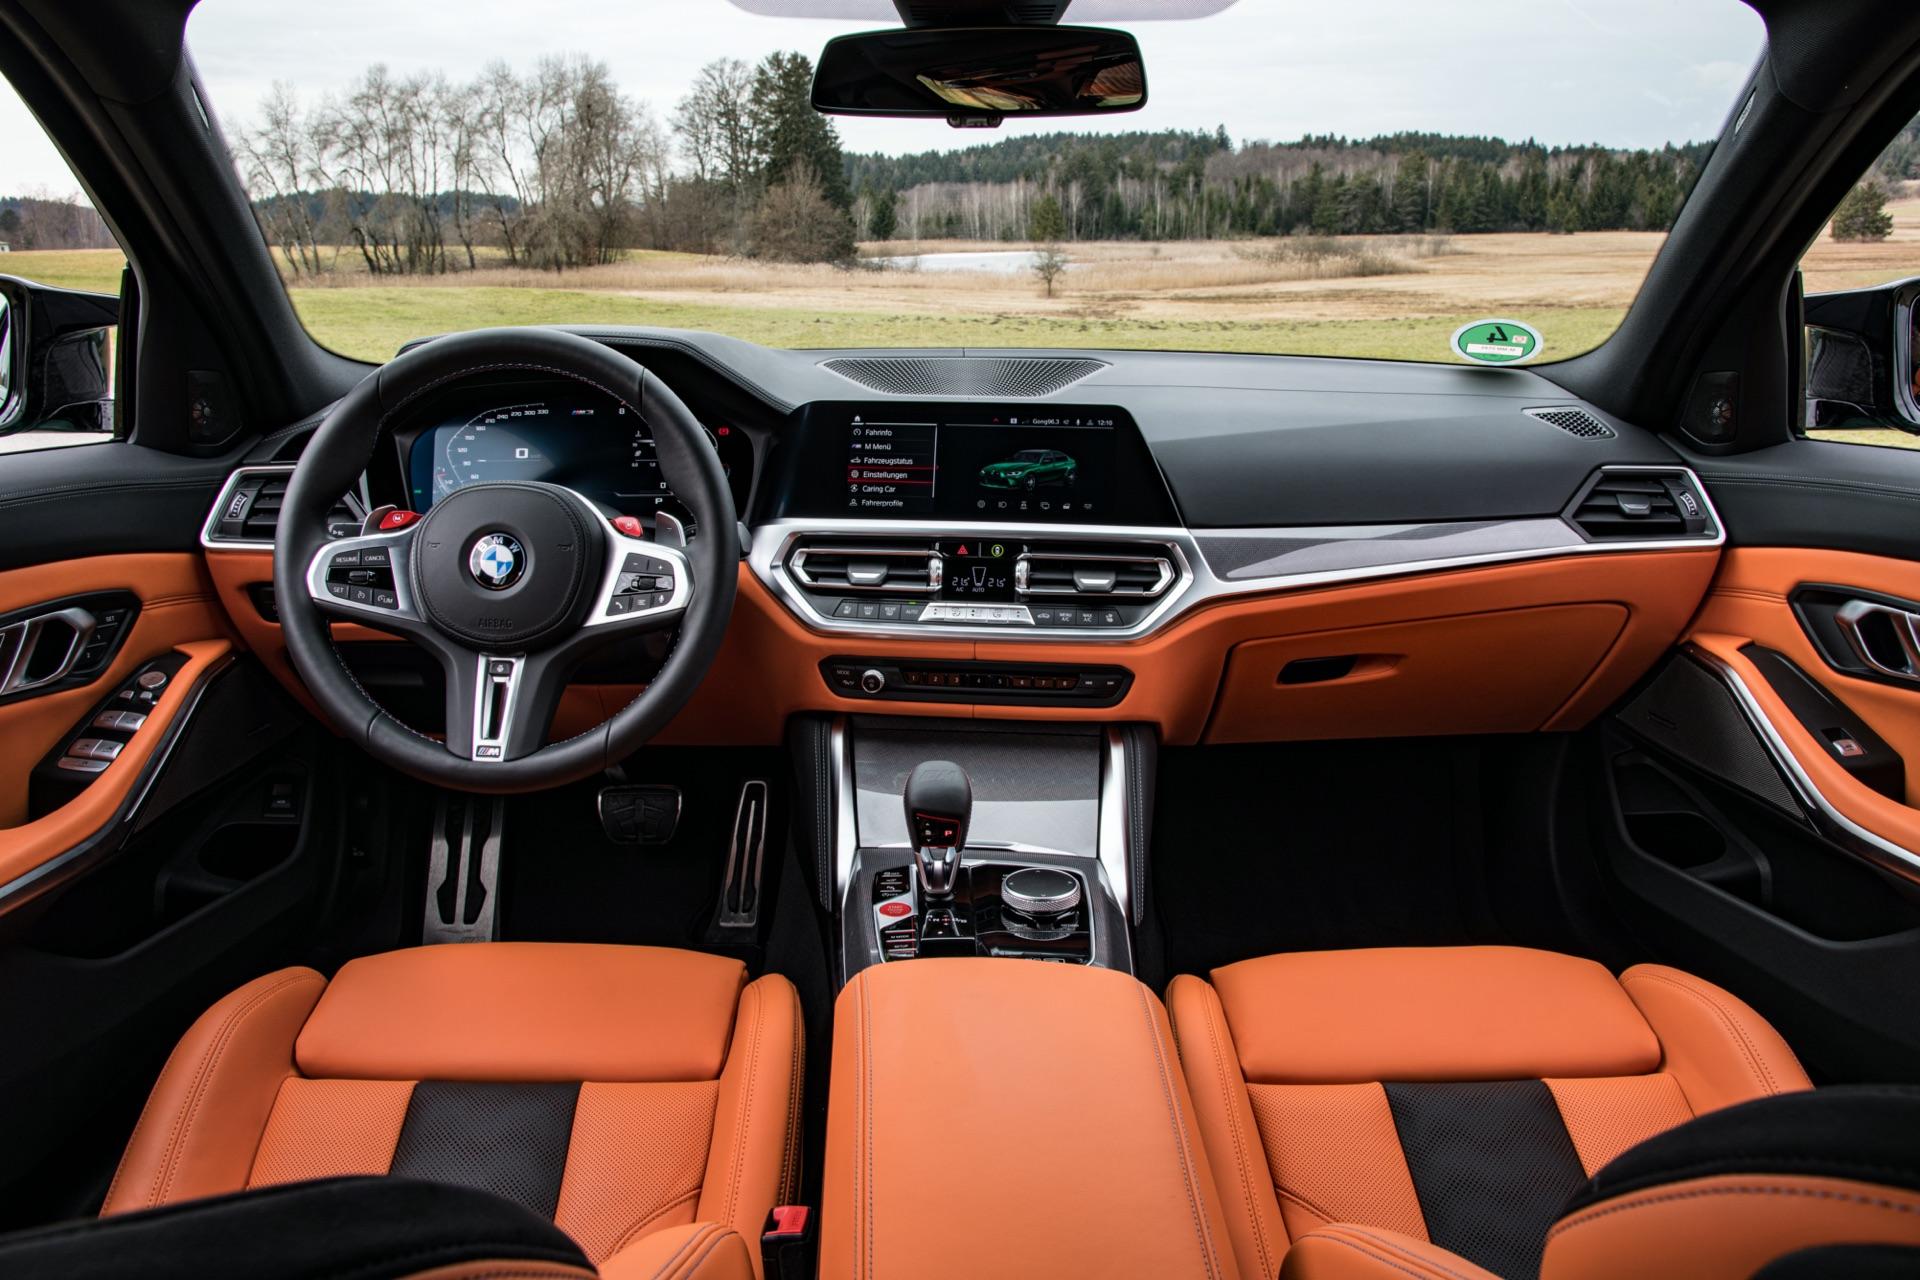 2022 BMW M3 interior